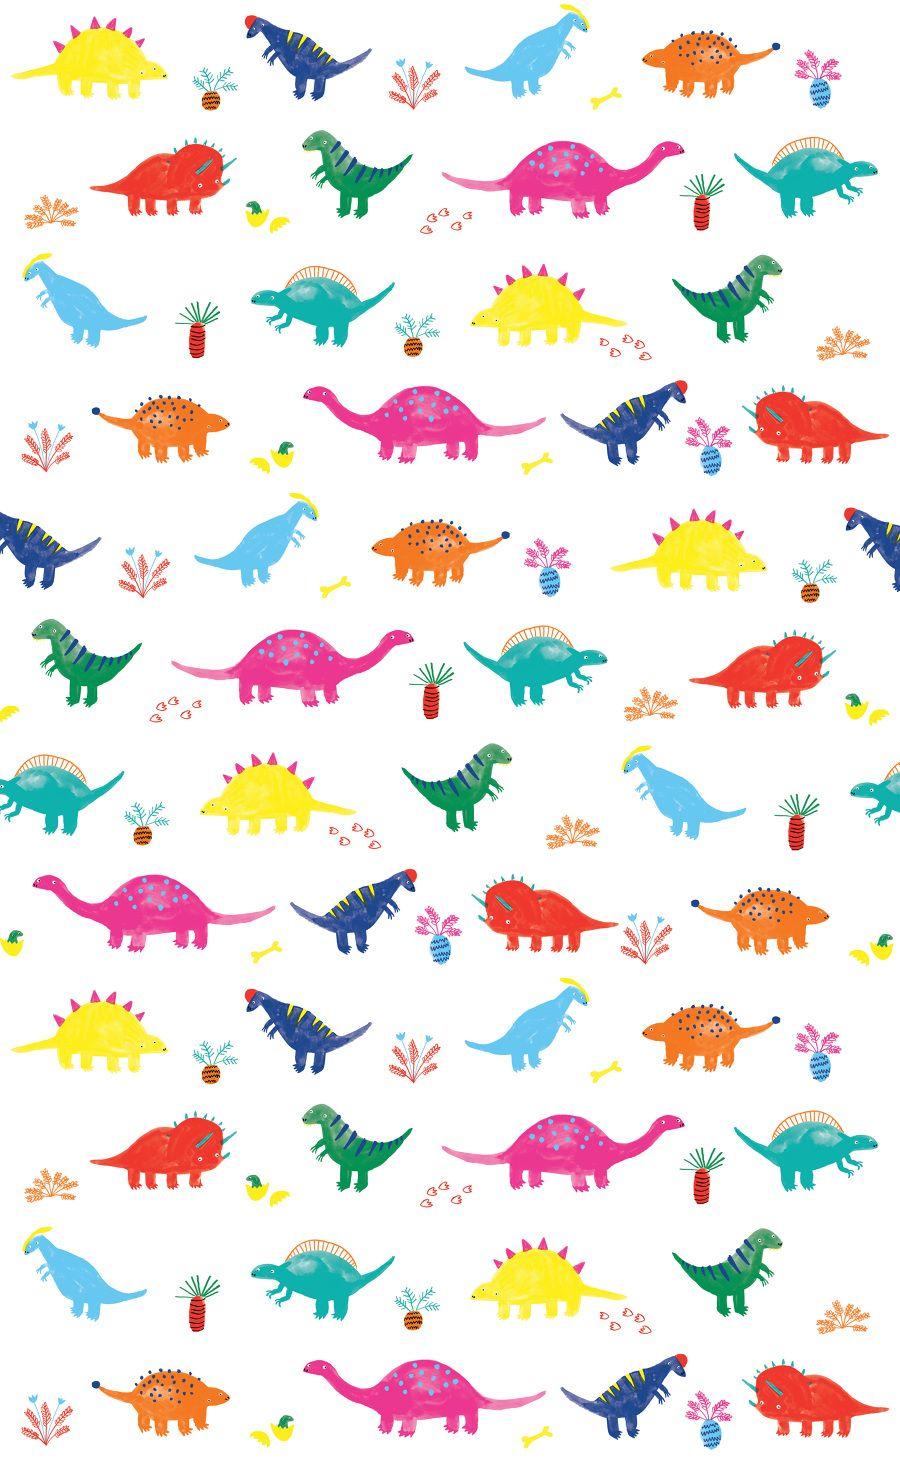 Dinosaur Pattern Lorna Scobie Illustration Pattern